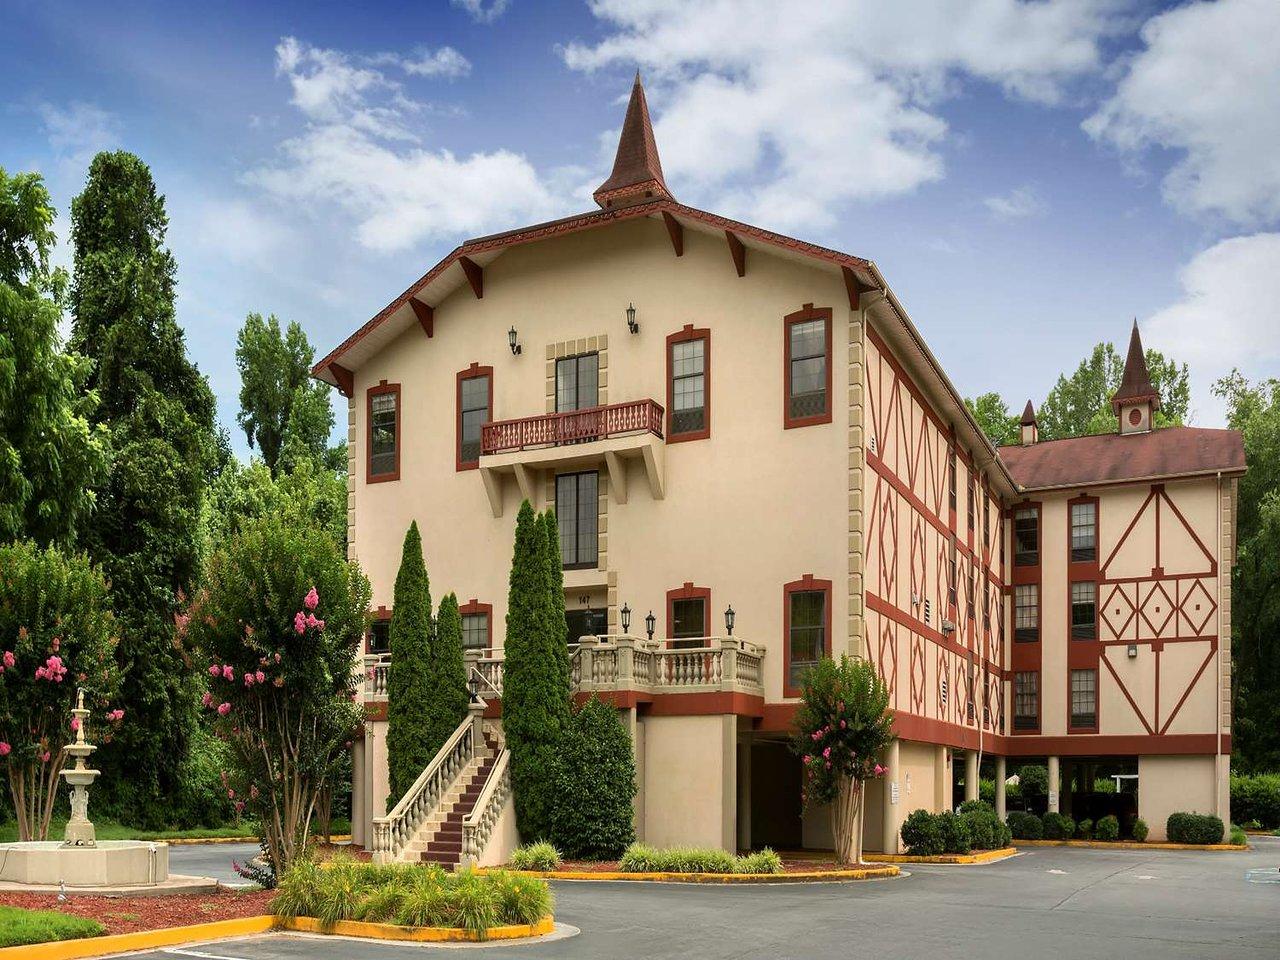 the 10 best hotels in cleveland ga for 2019 from 56 tripadvisor rh tripadvisor com